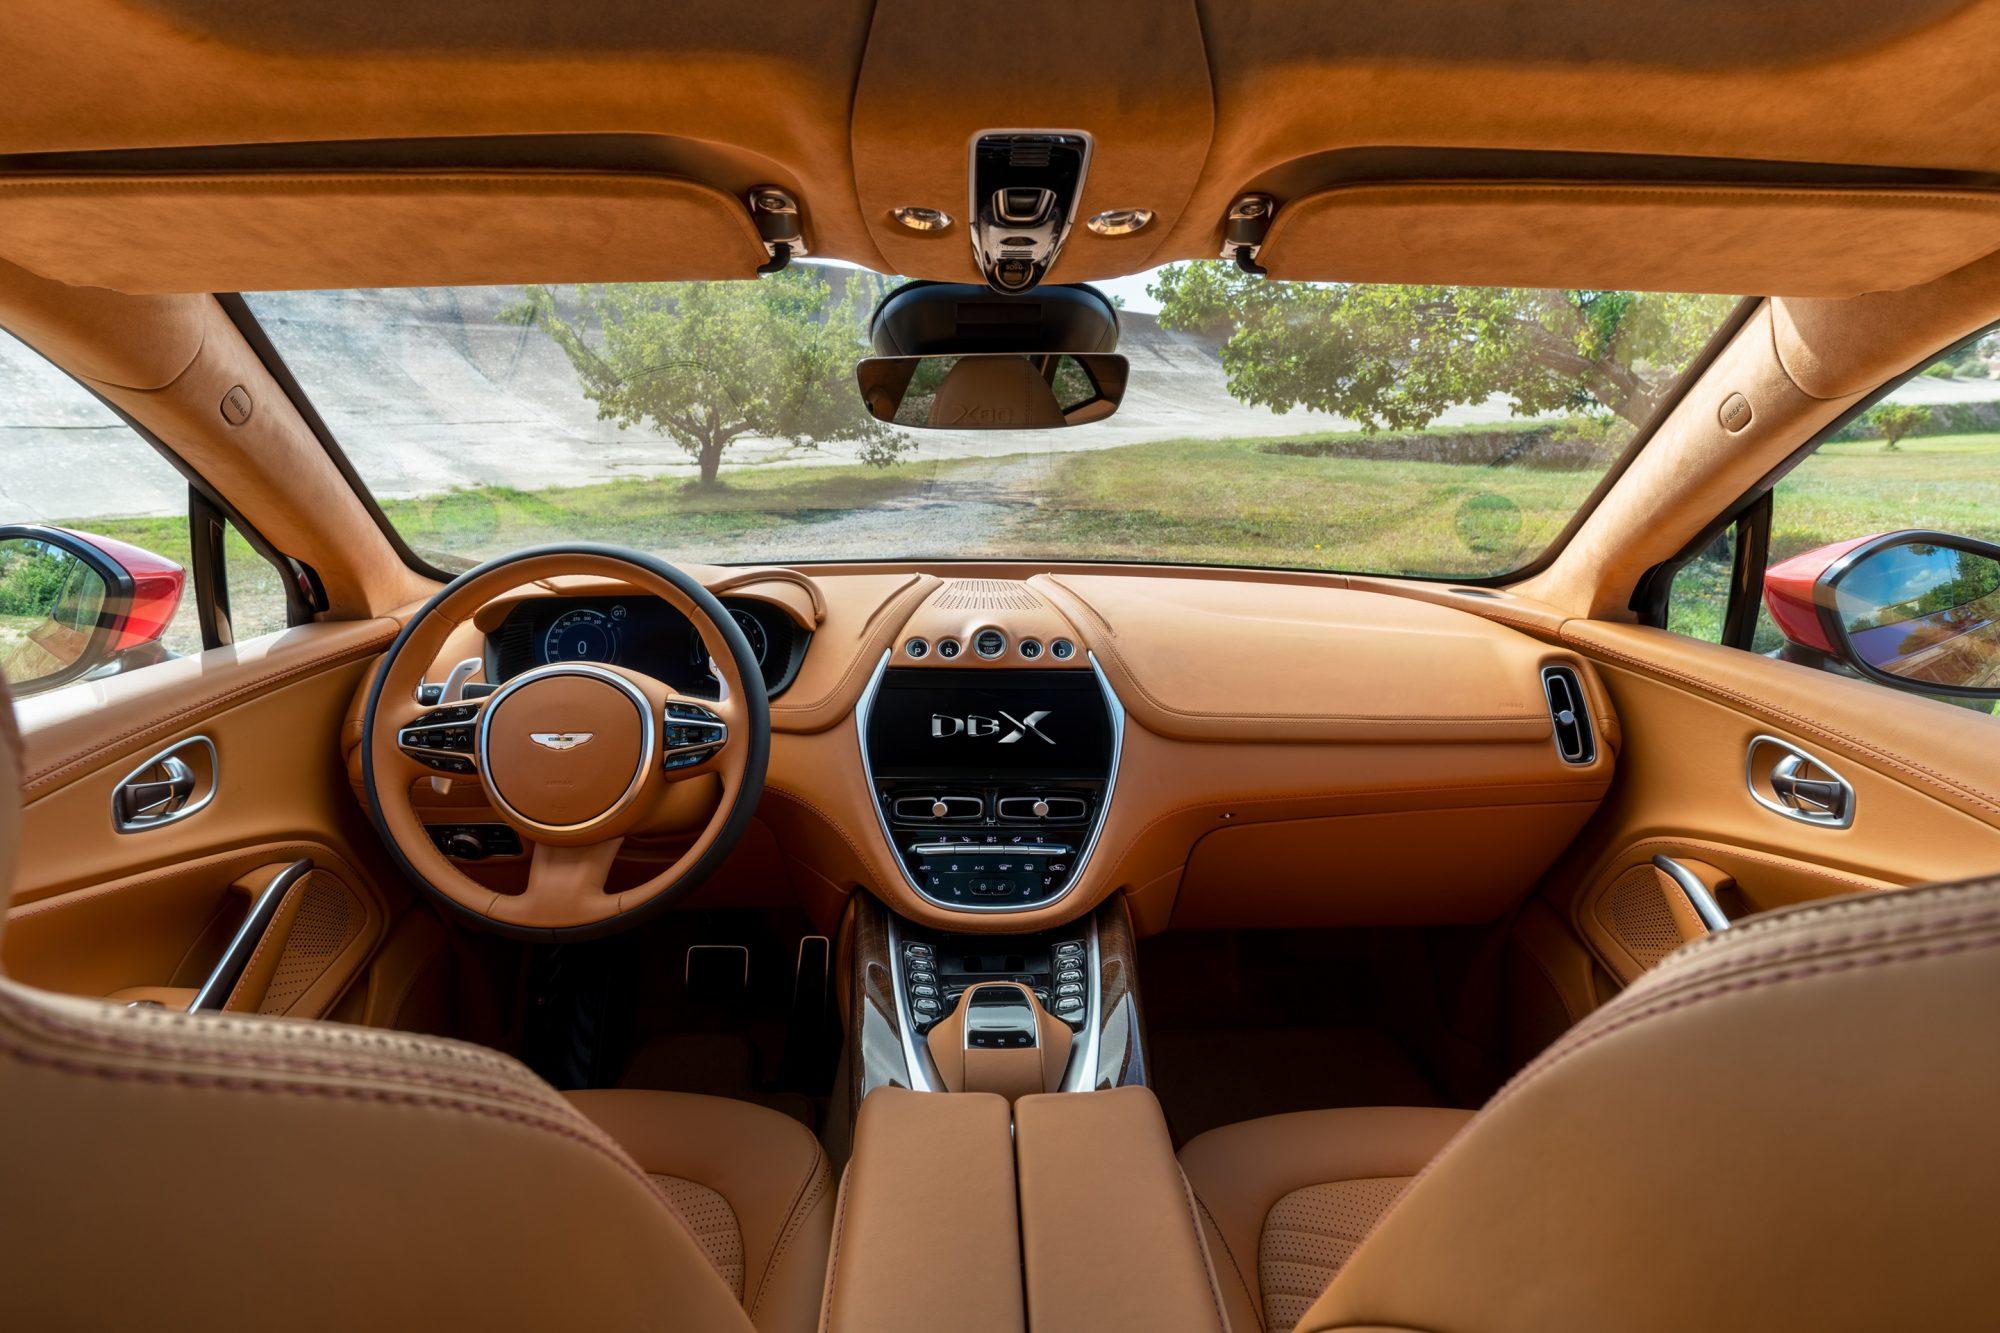 Aston Martin DBX suv - petrolhead corner - 5